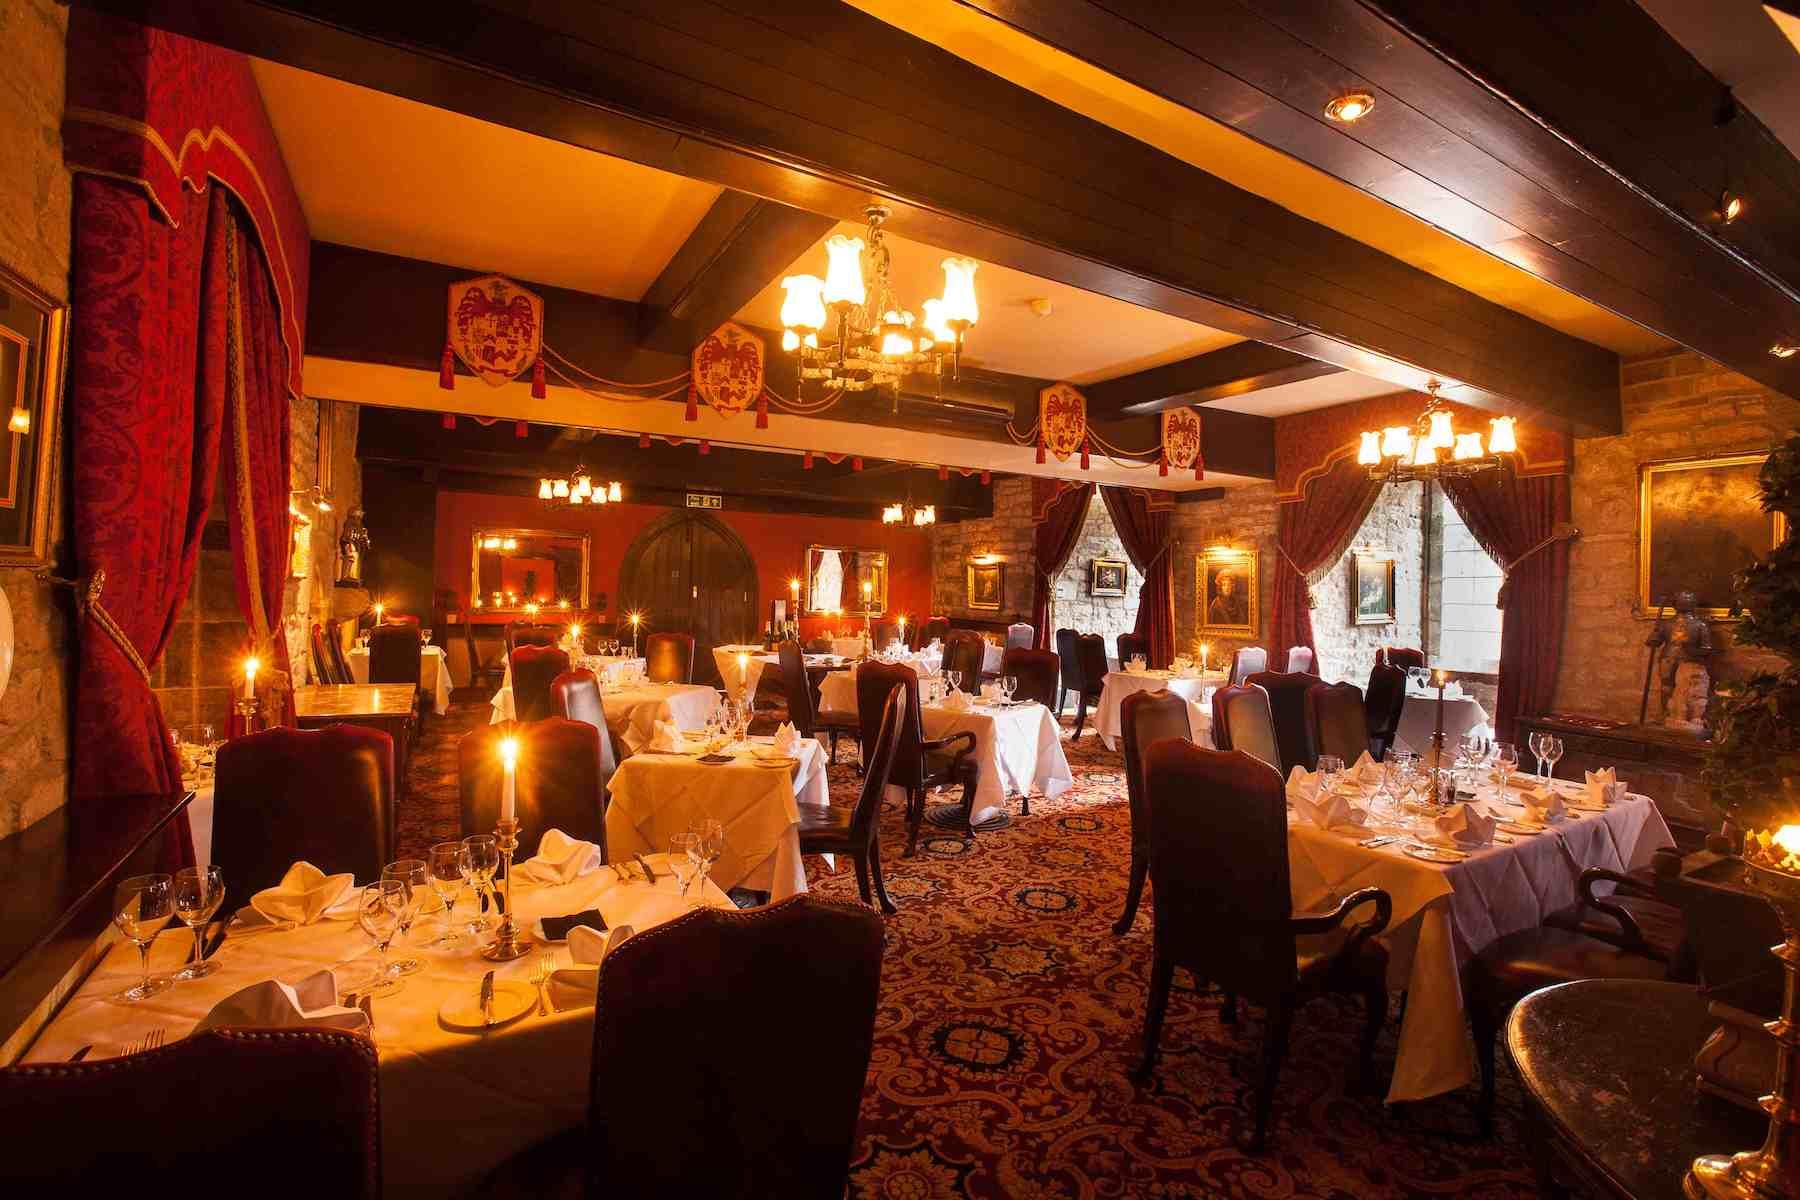 Josephine Restaurant at Langley Castle